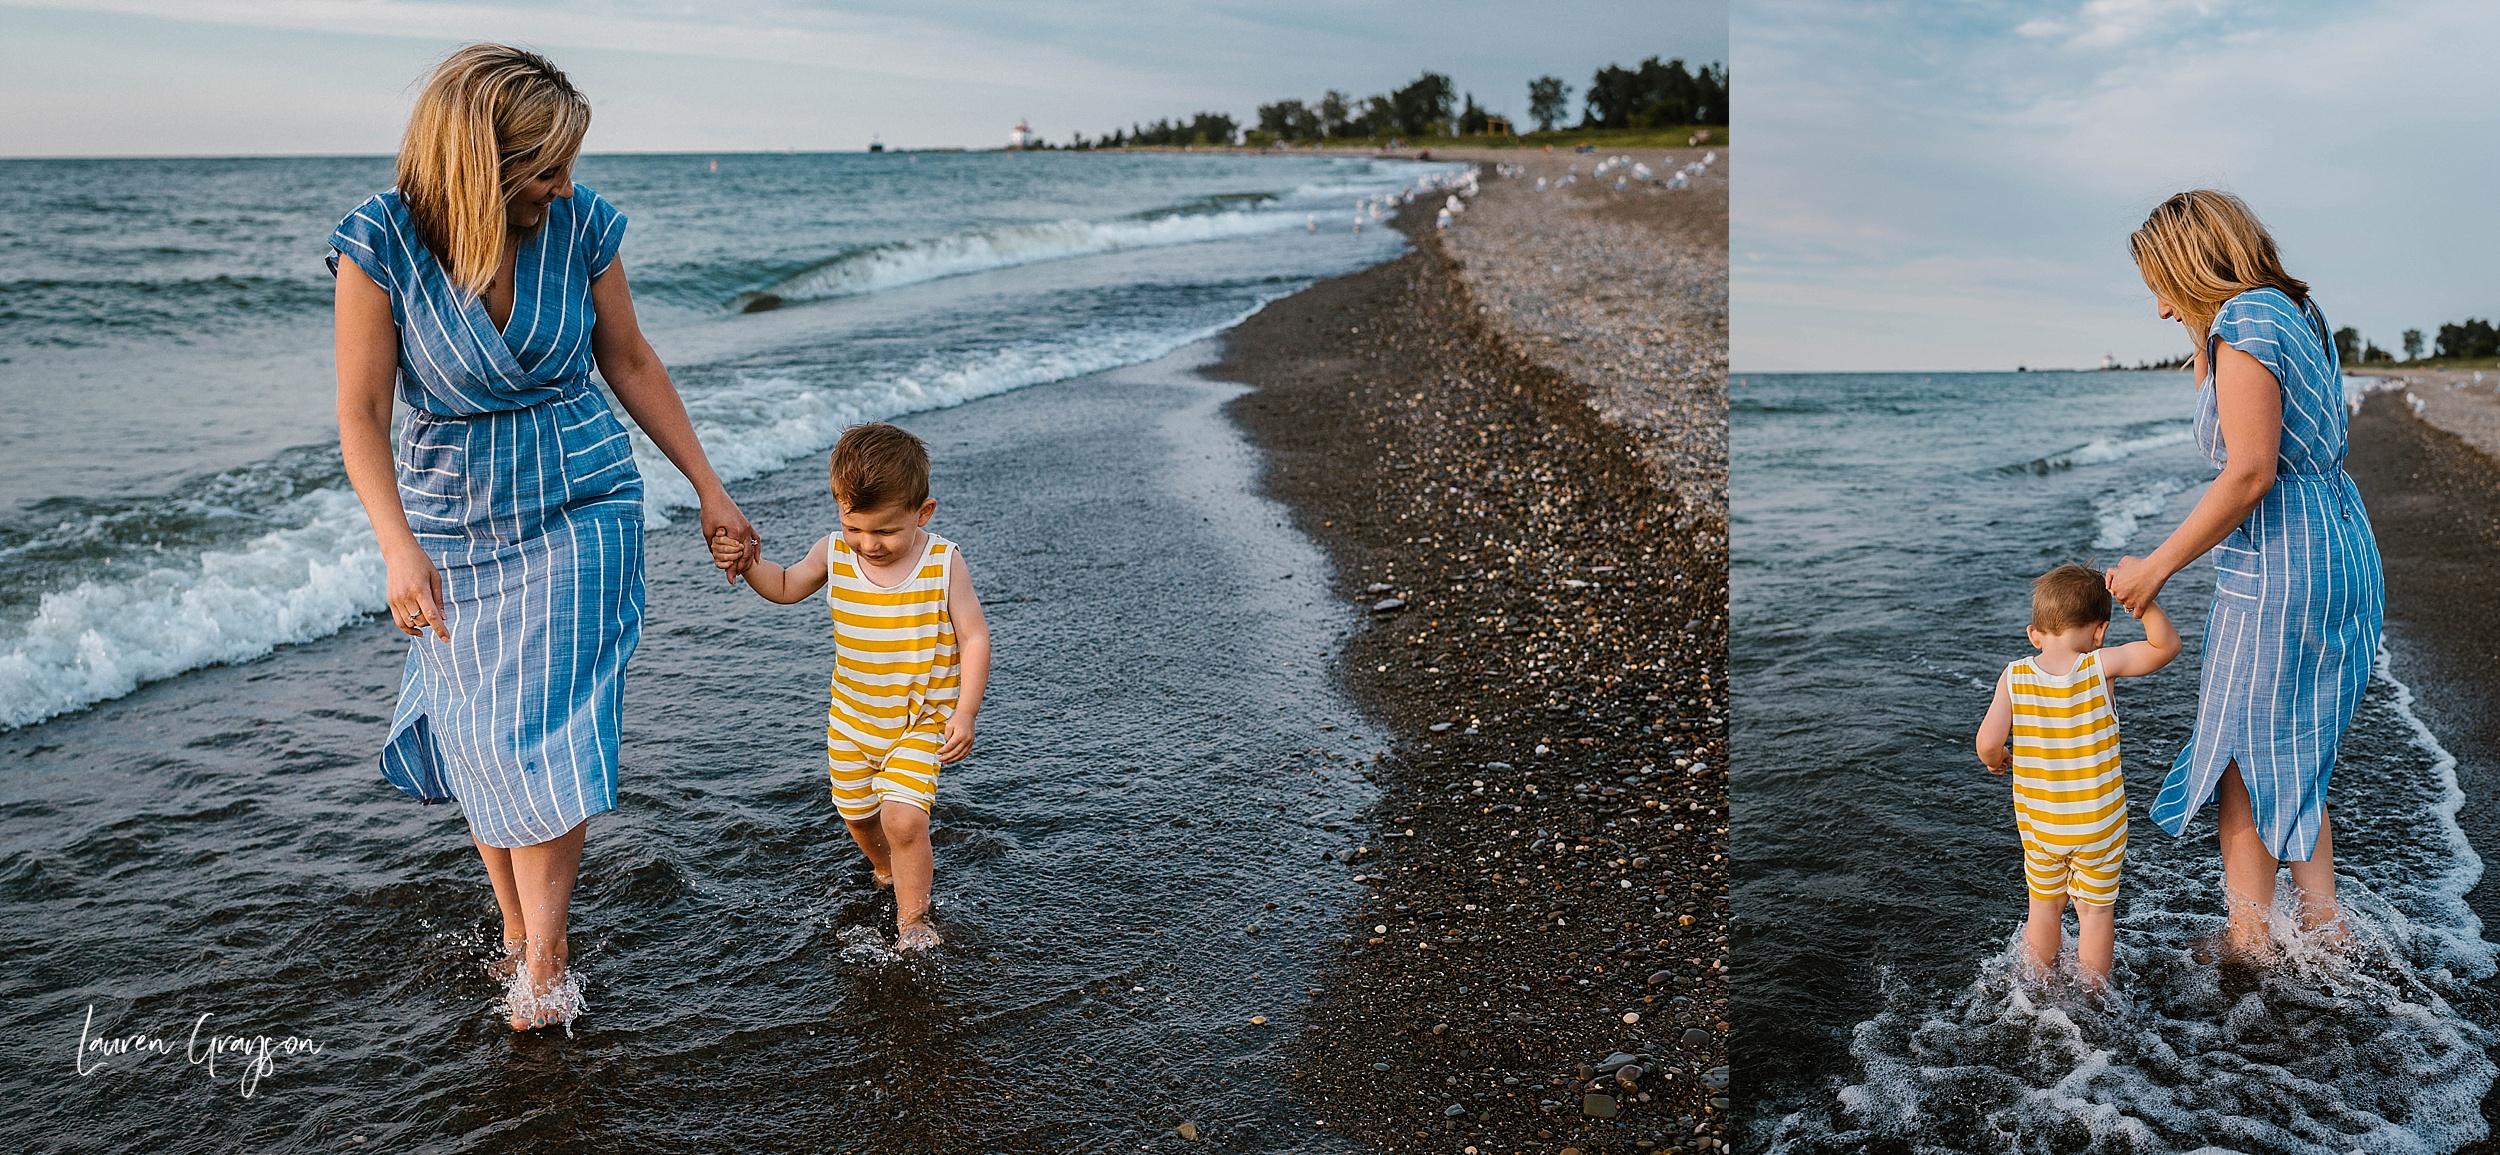 lauren-grayson-photography-cleveland-ohio-photographer-mentor-headlands-beach-maternity-session-2018_0764.jpg